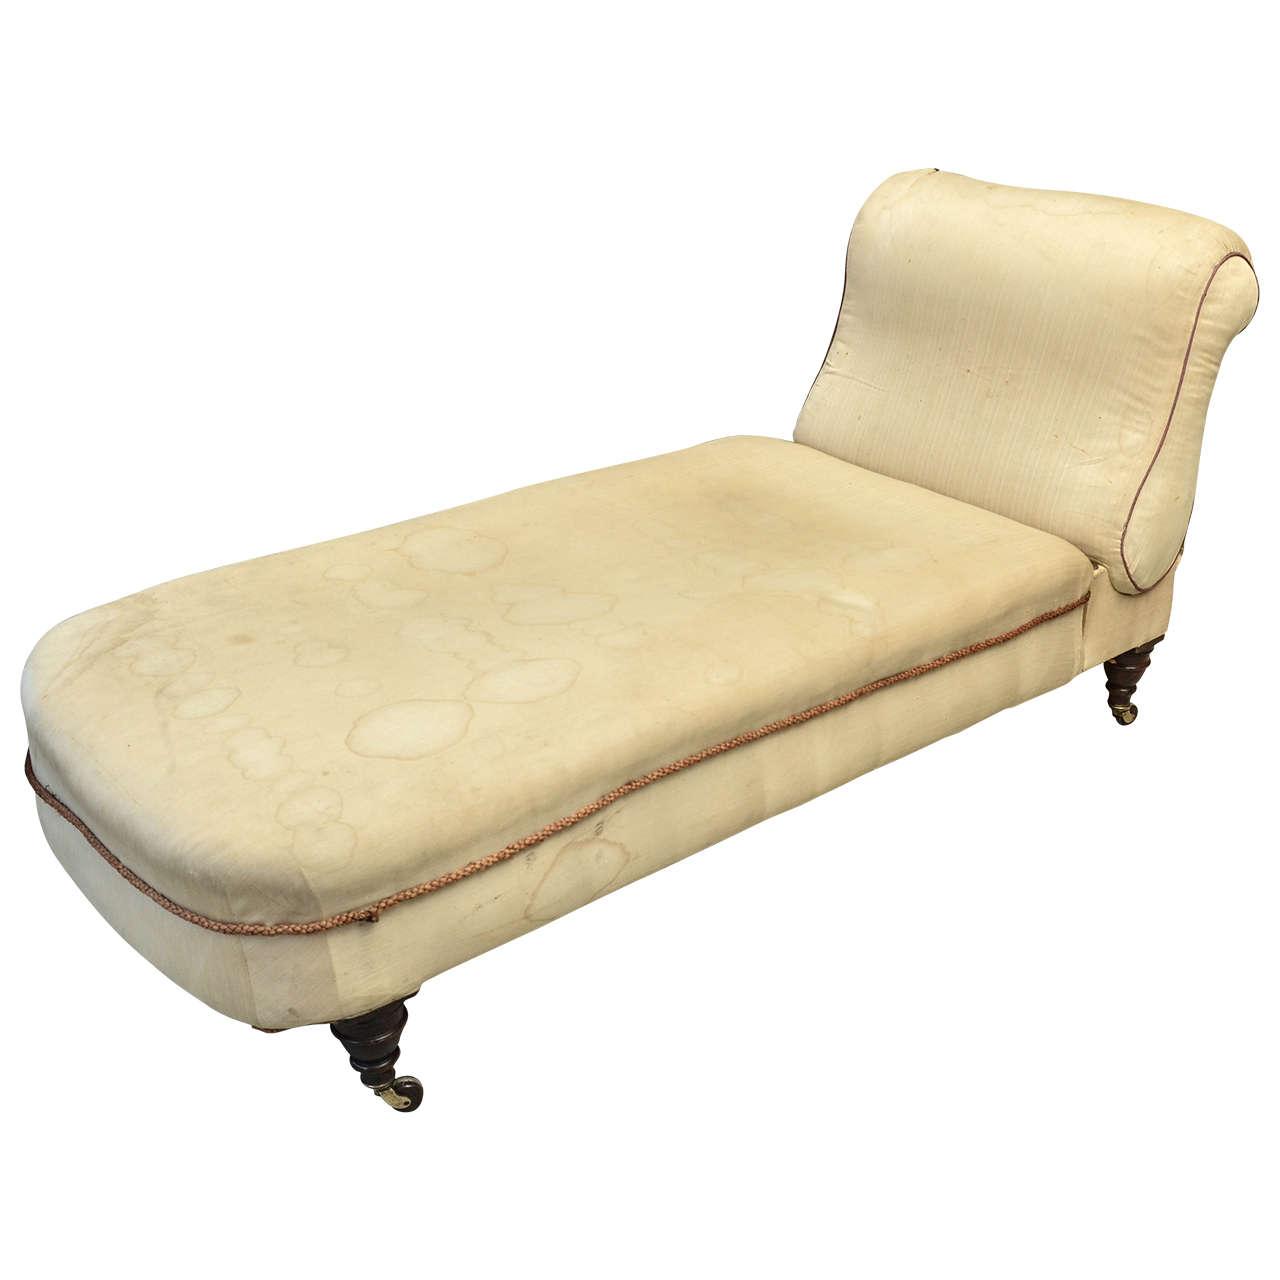 English Victorian Ratchet Back Chaise Longue